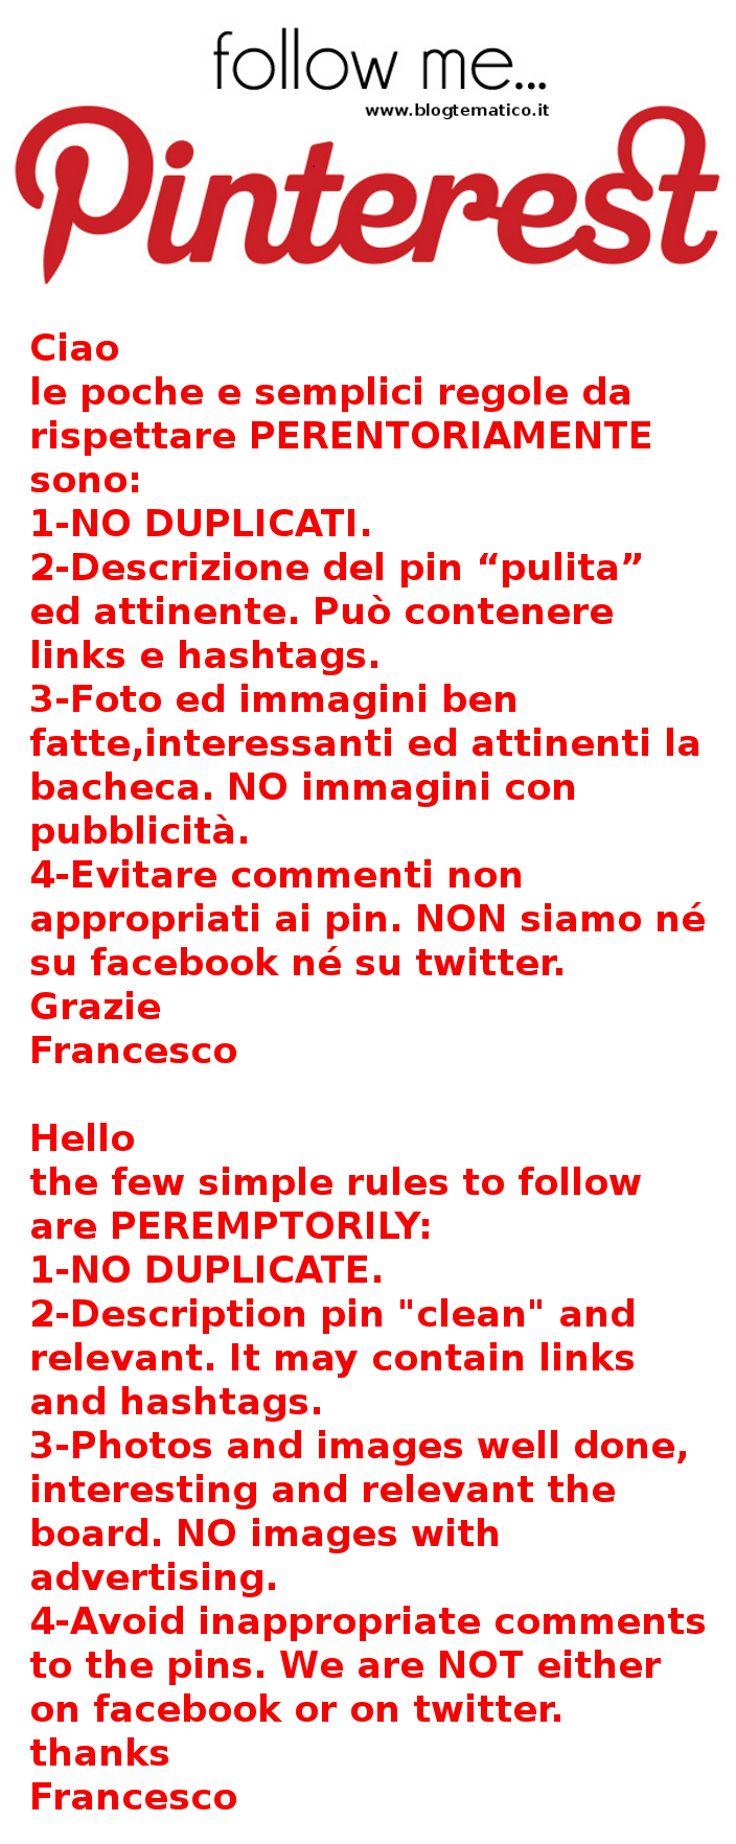 Infografica. Hashtag e link:CLIC sopra per raggiungerli e vederli #Expo2015 #WonderfulExpo2015 #ExpoMilano2015 #Wonderfooditaly #FrancescoBruno   @Francesco Bruno www.blogtematico.it/?lang=en  frbrun@tiscali.it